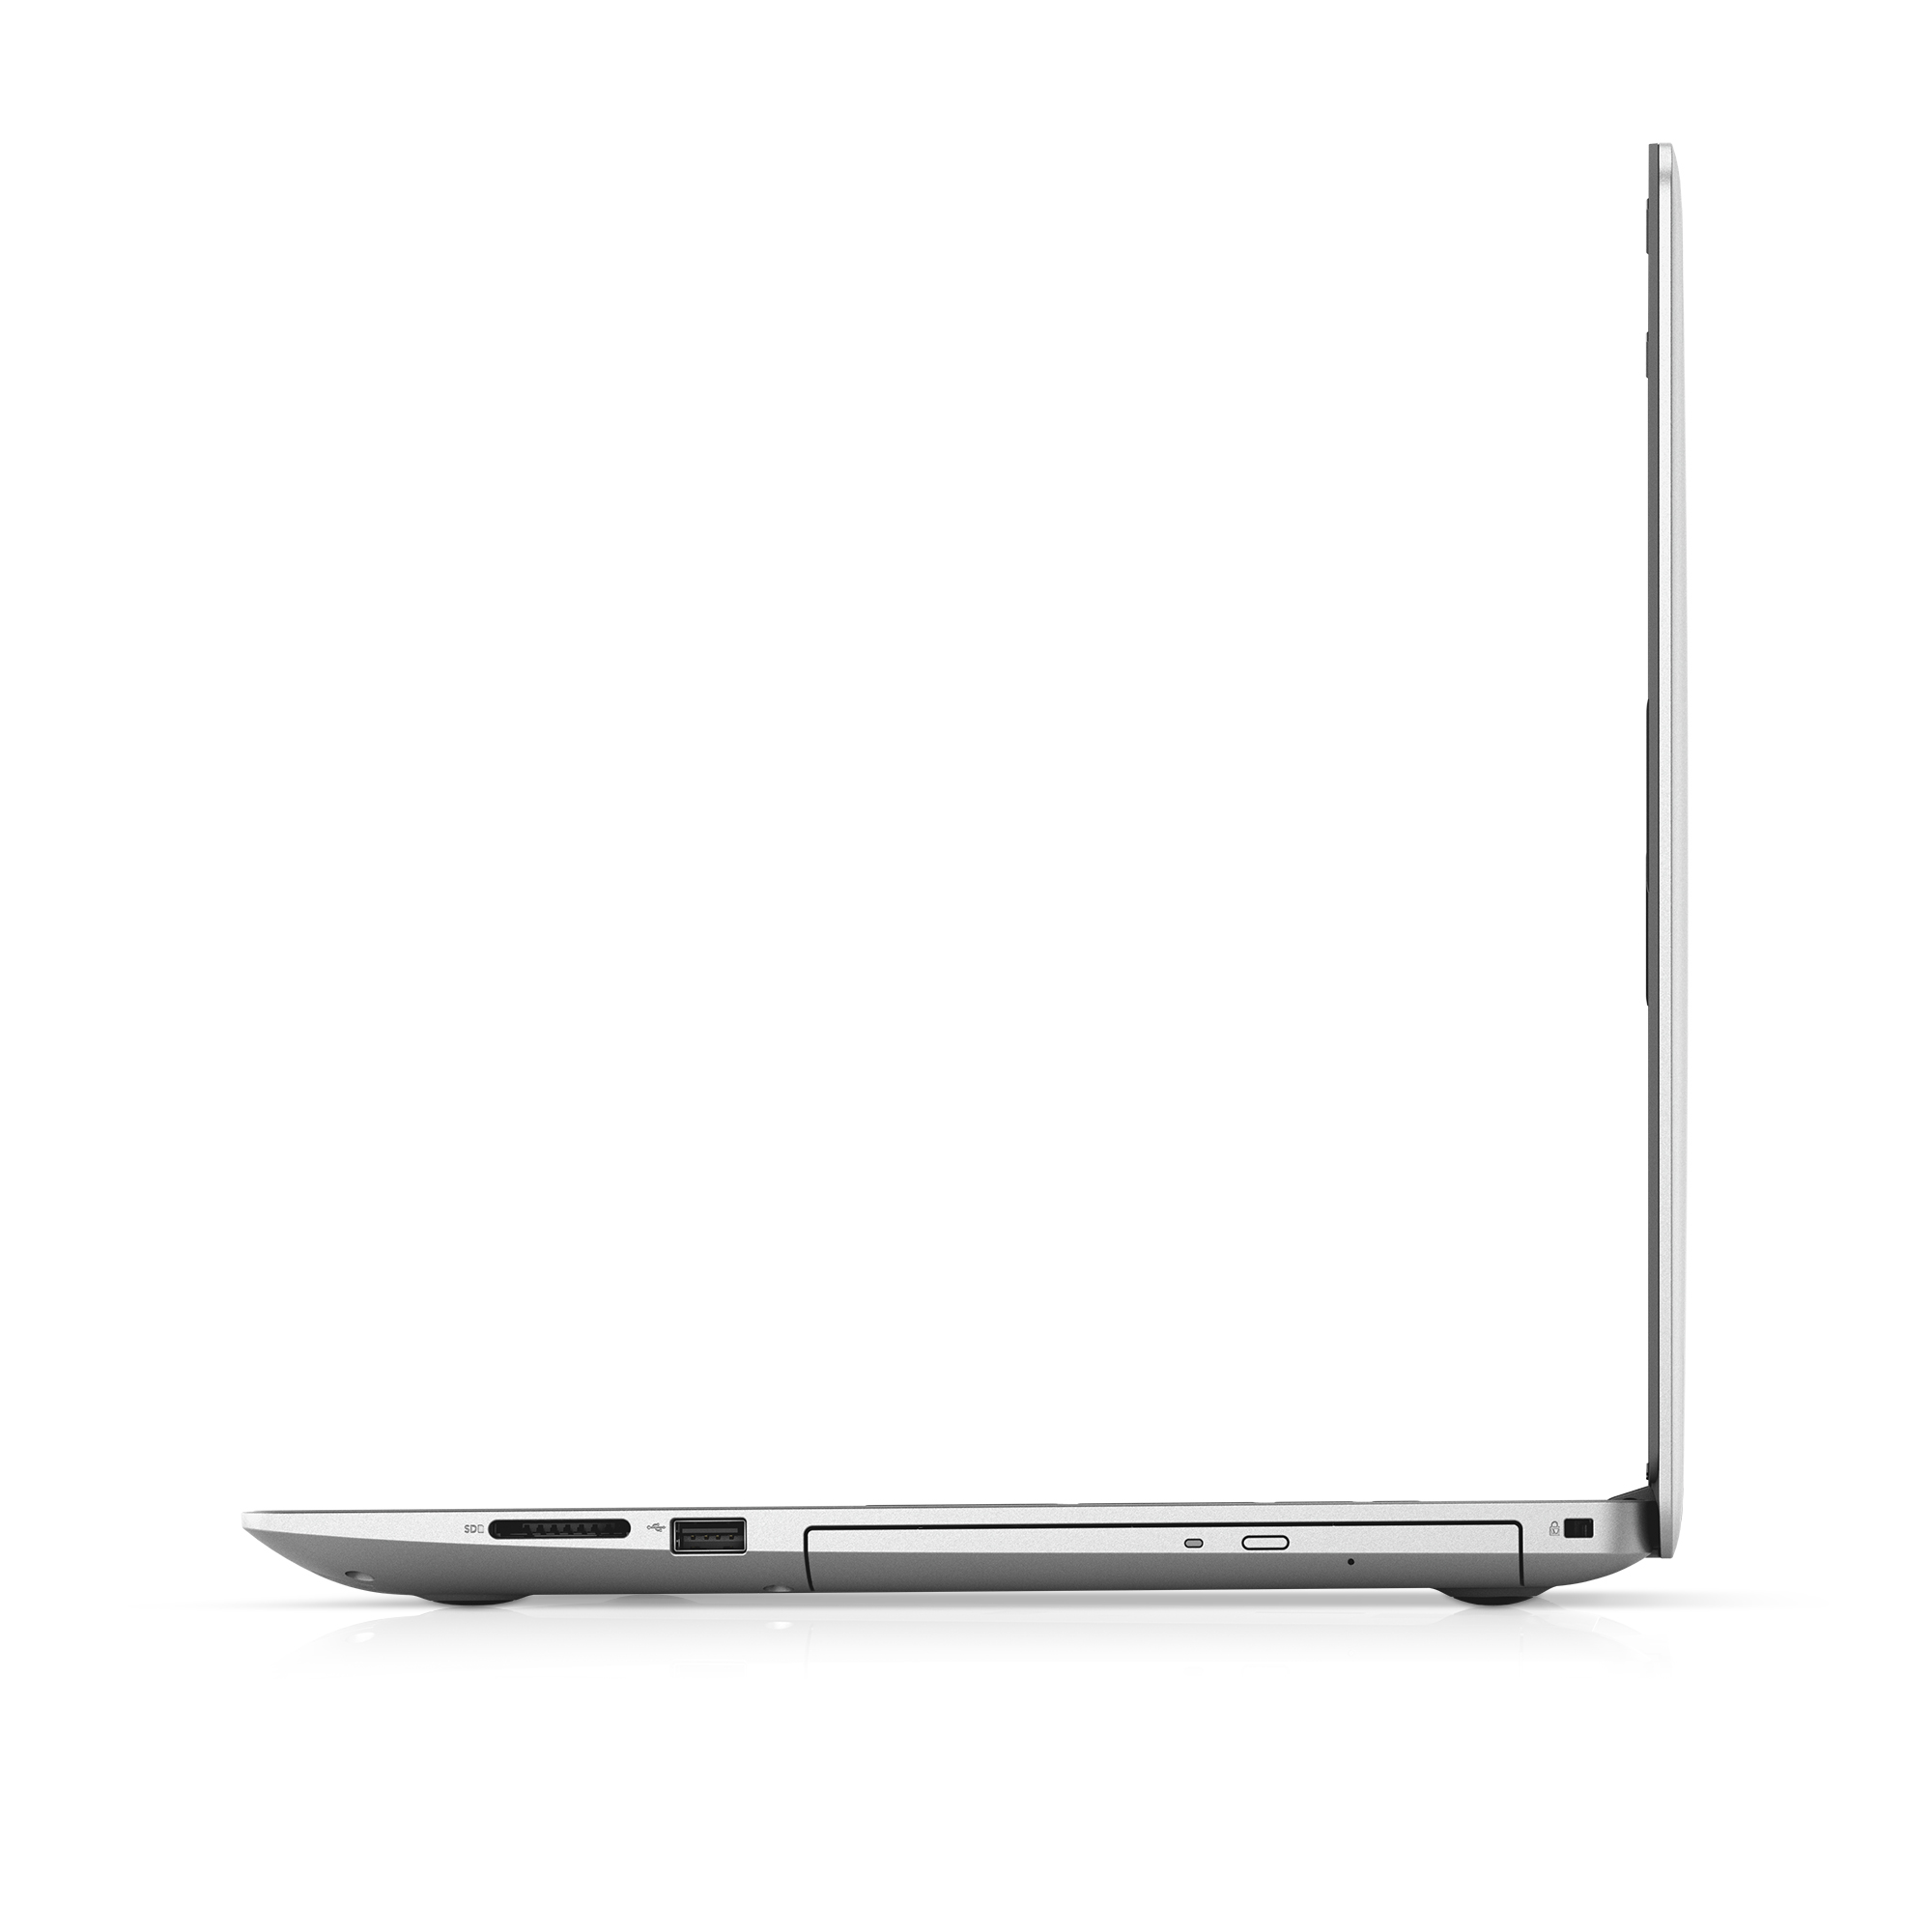 Dell i5575-A347SLV Inspiron Laptop, 15 6'' Touchscreen, AMD Ryzen 5